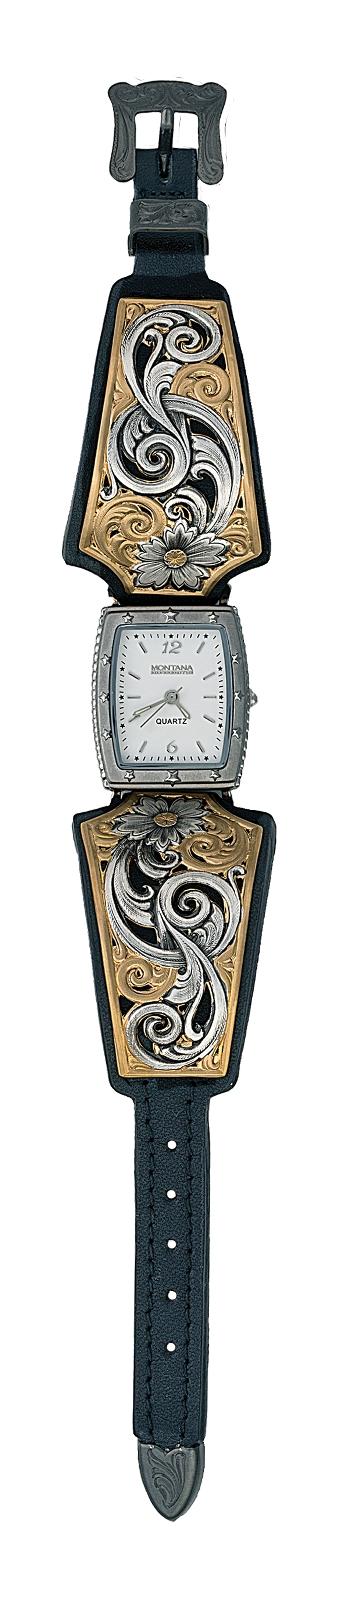 Montana Silversmiths Bitterroot Posey Cuff Bracelet Watch